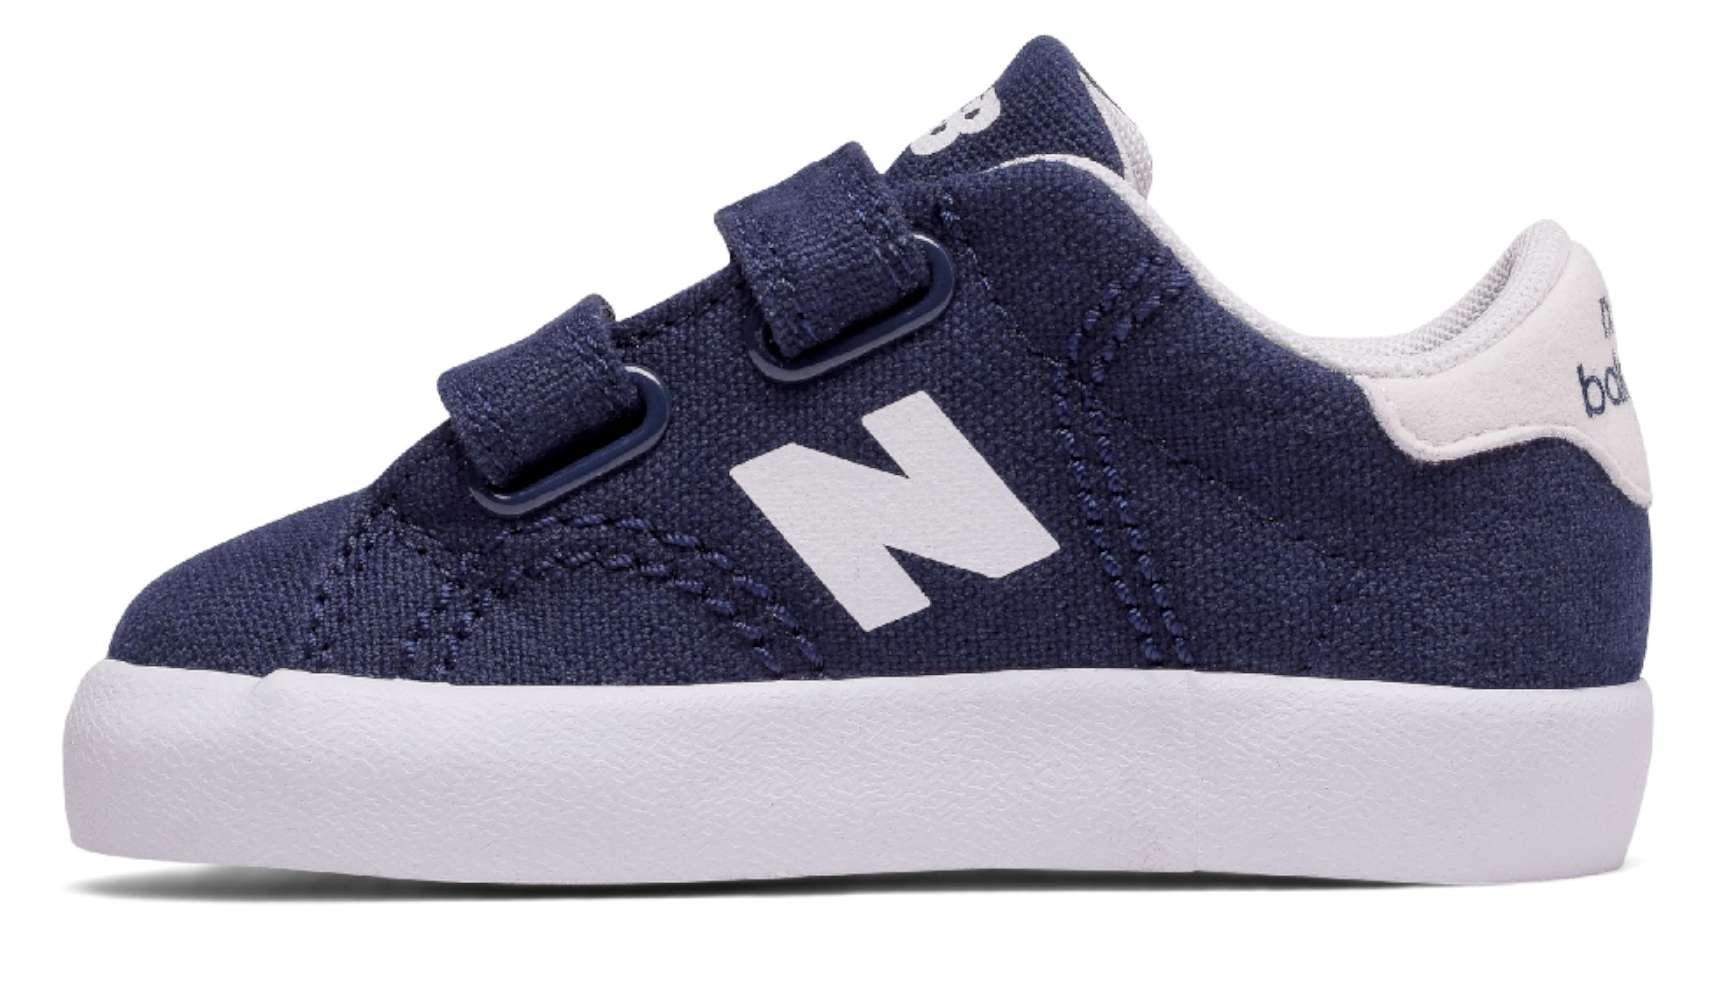 New Balance Boys KVCRTNWI Low Top Velcro Walking Navy/White Size Toddler 9M